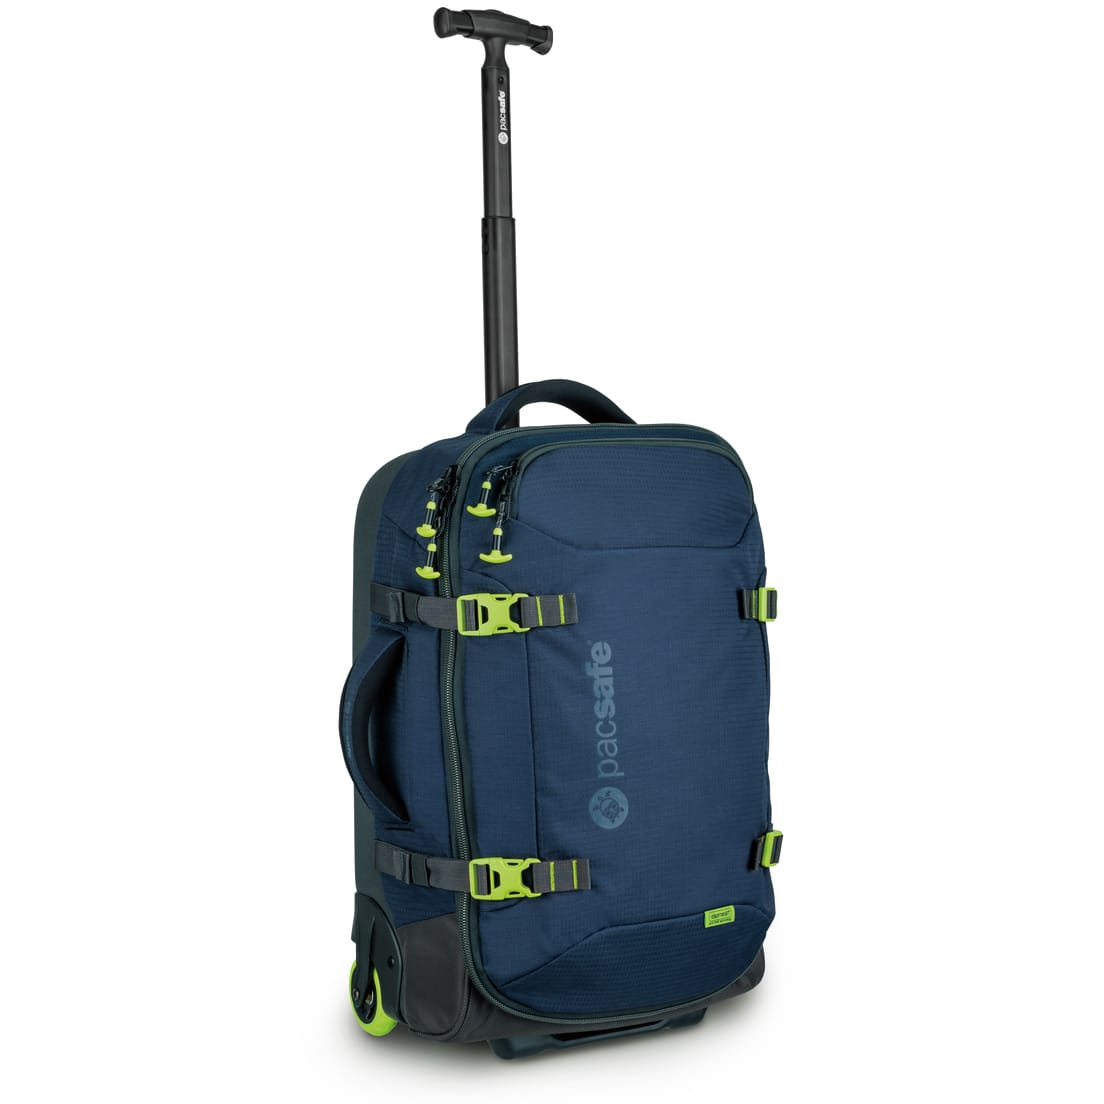 97e830650269 Pacsafe Toursafe Anti-Theft Wheeled Luggage